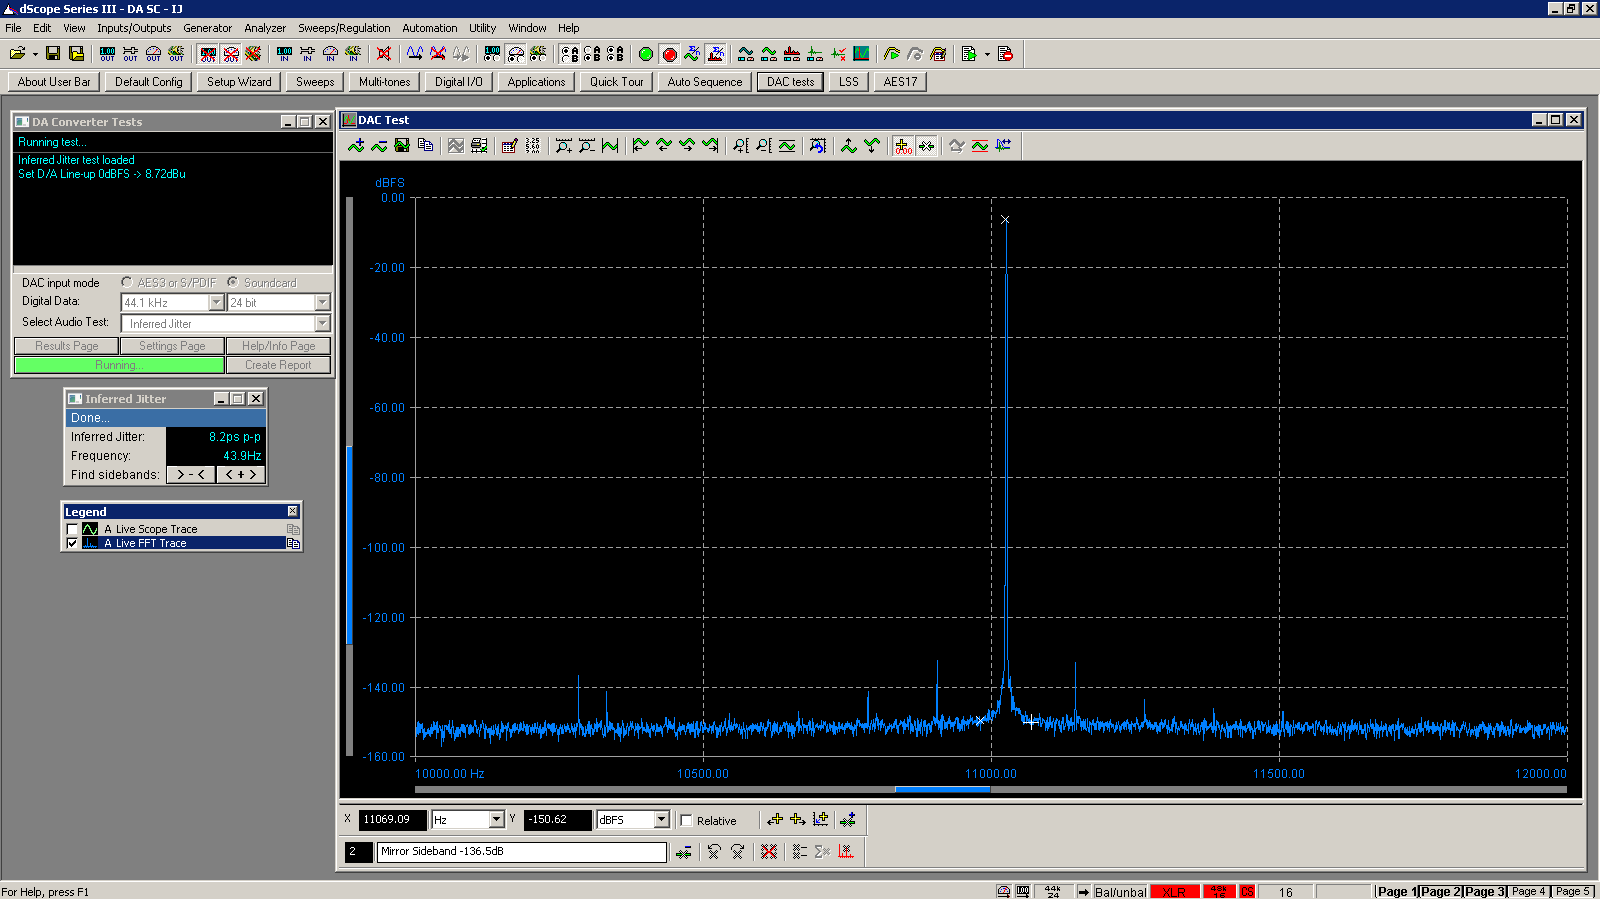 20151013 Bifrost MB SE inferred jitter - 2KHz BW - USB.PNG